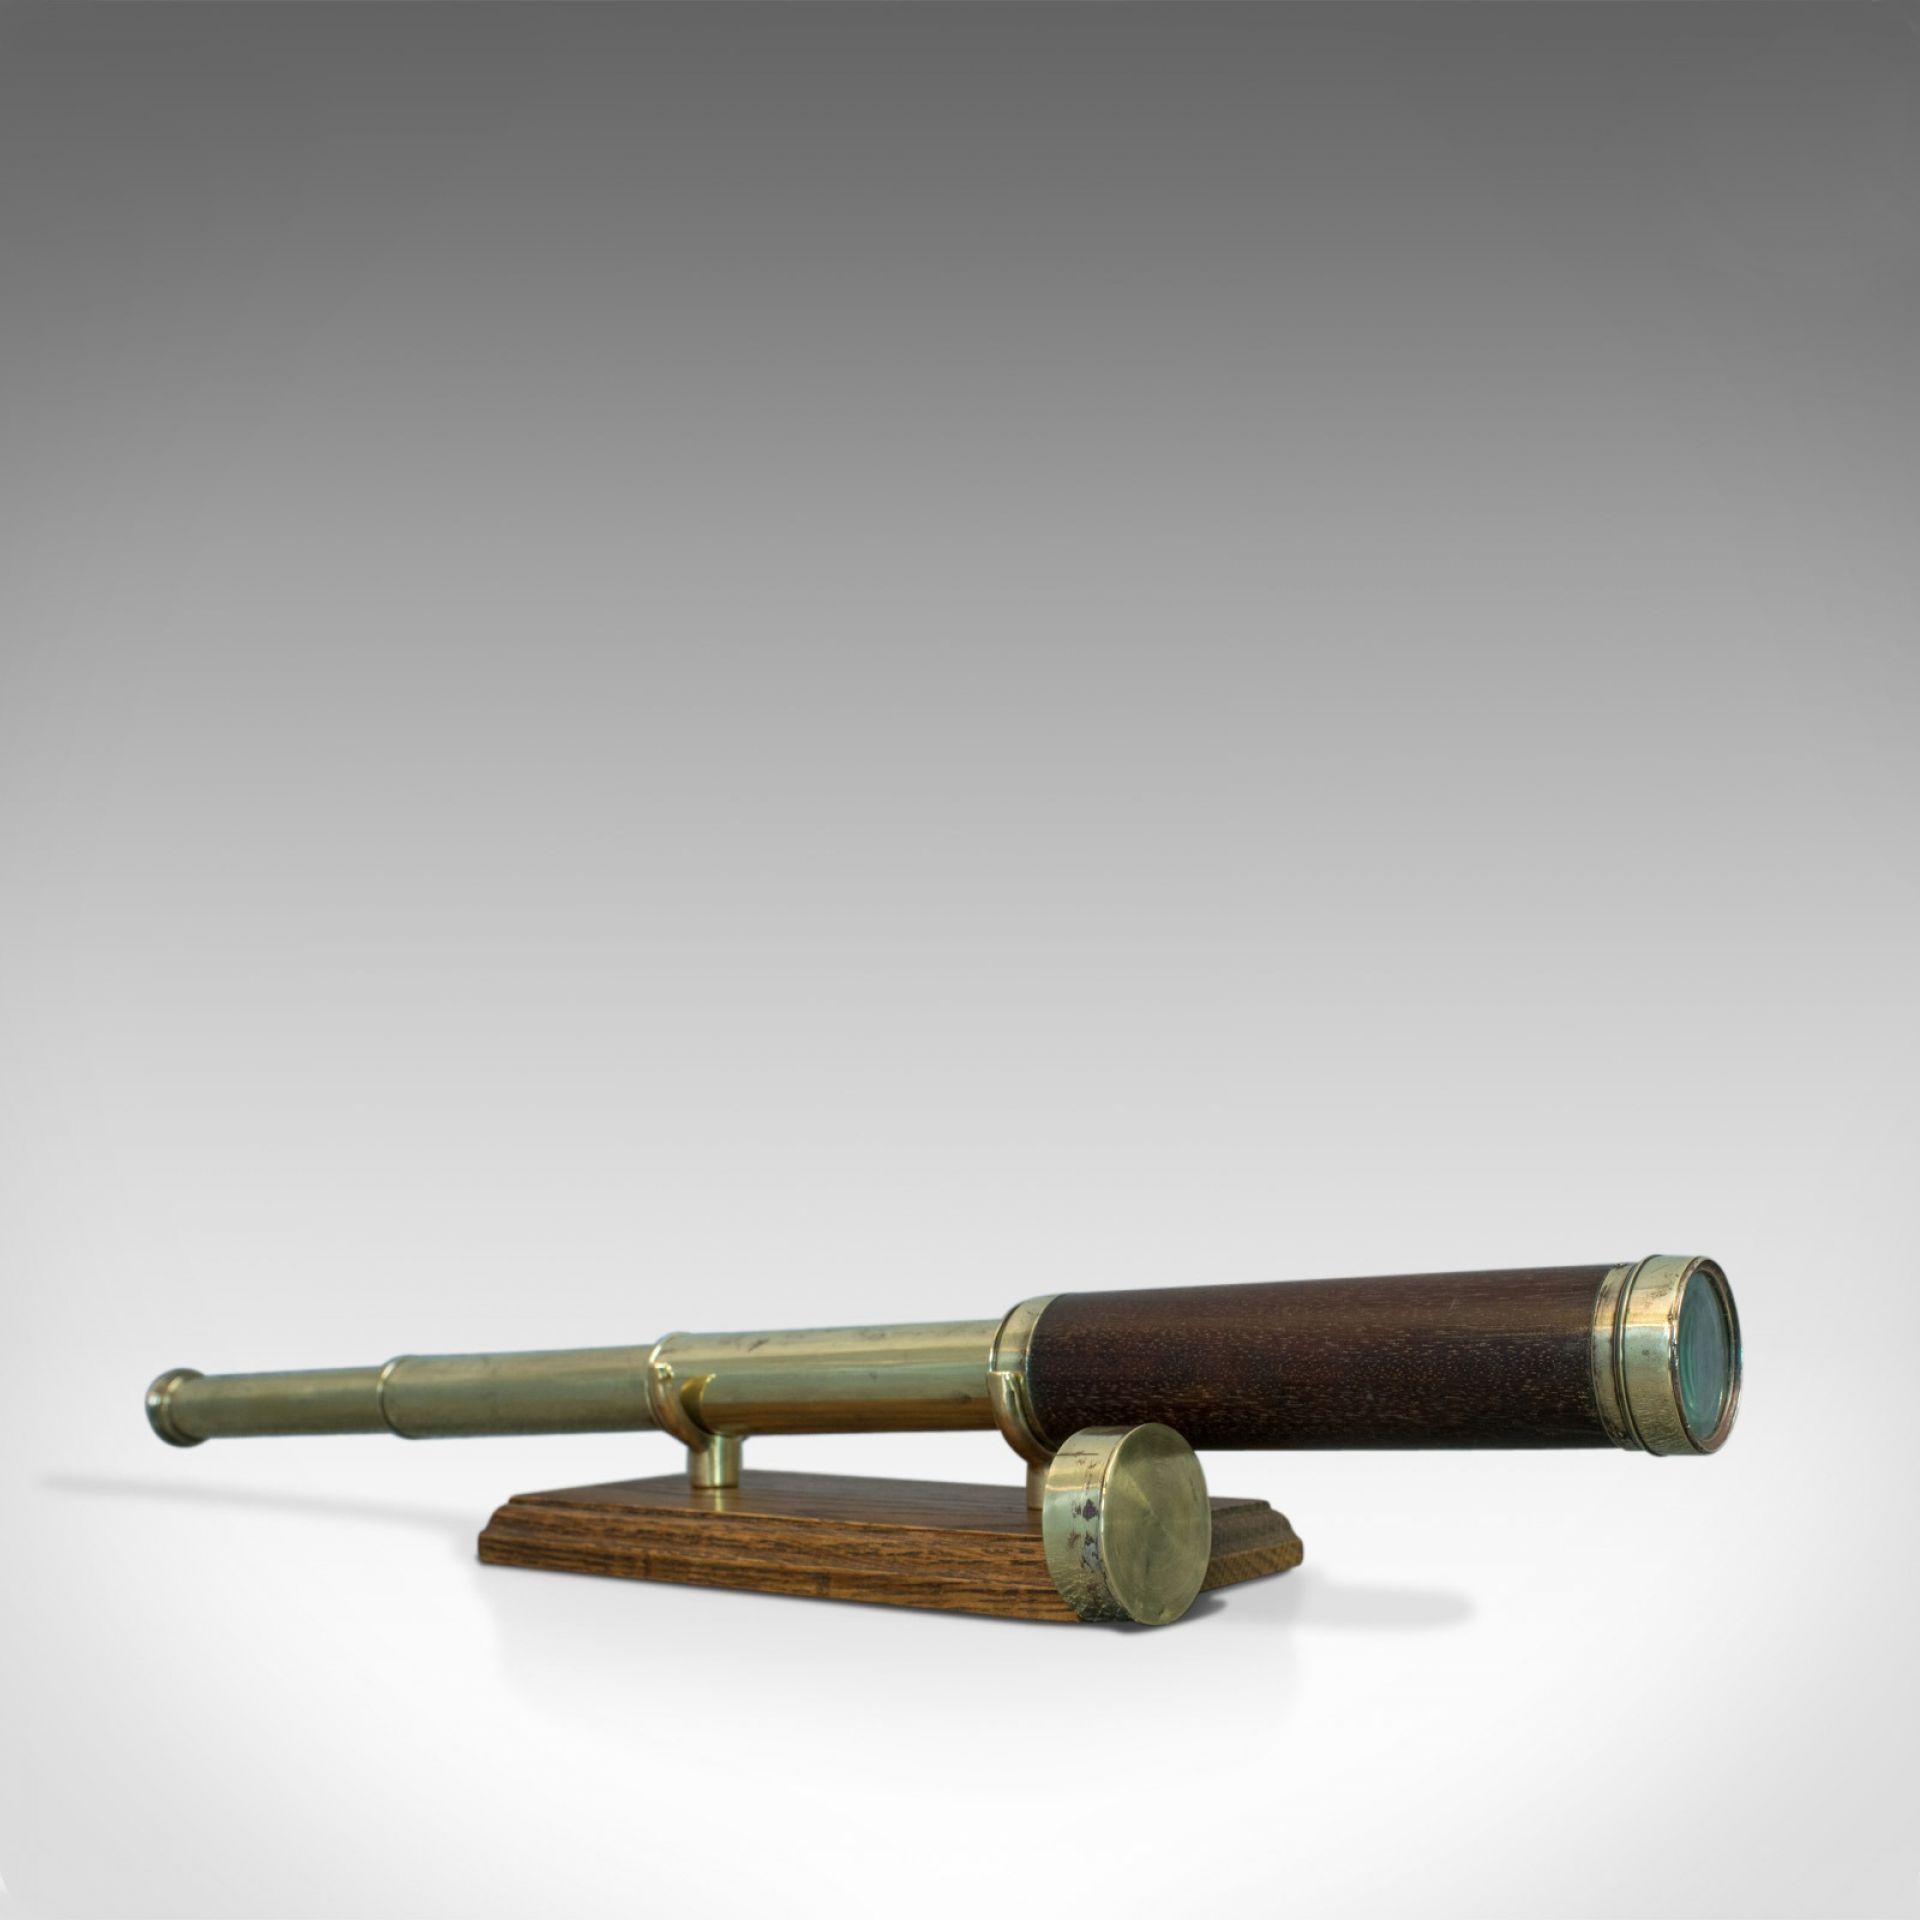 Antique Telescope, English, 3 Draw Refractor, Silberrad Aldgate, 19th Century